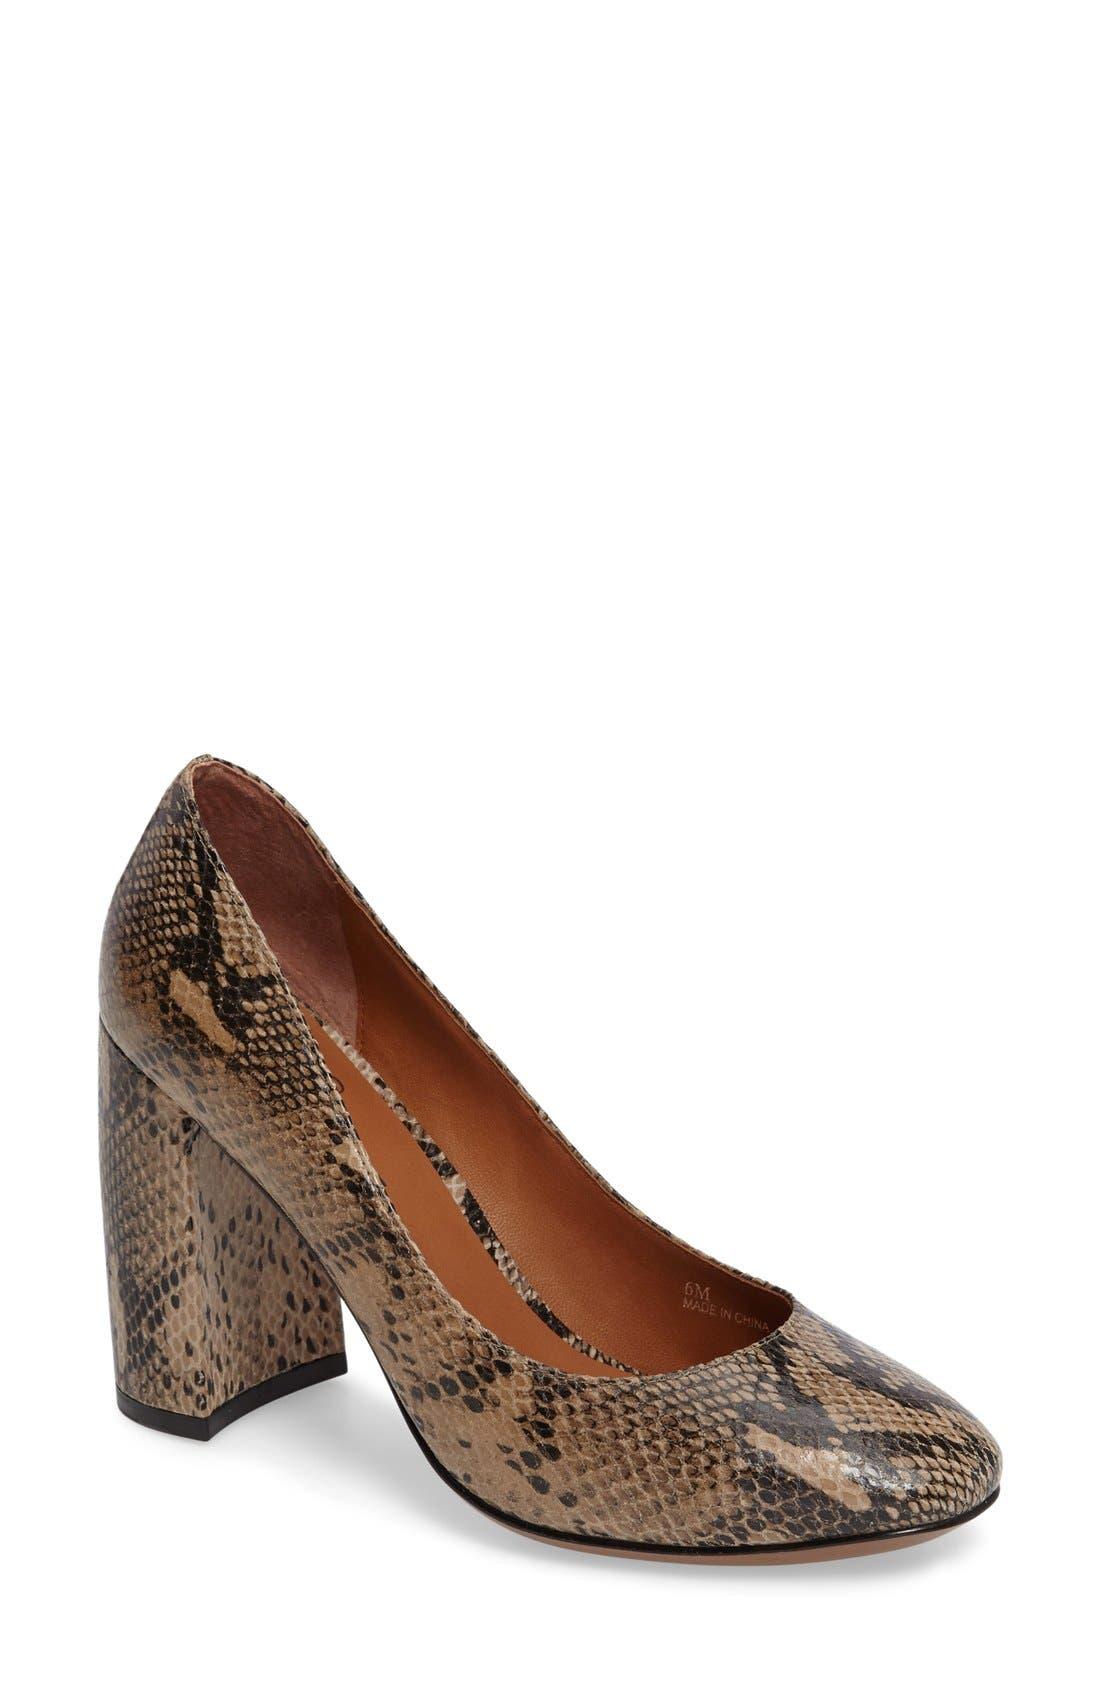 Alternate Image 1 Selected - Linea Paolo 'Brooke' Block Heel Pump (Women)